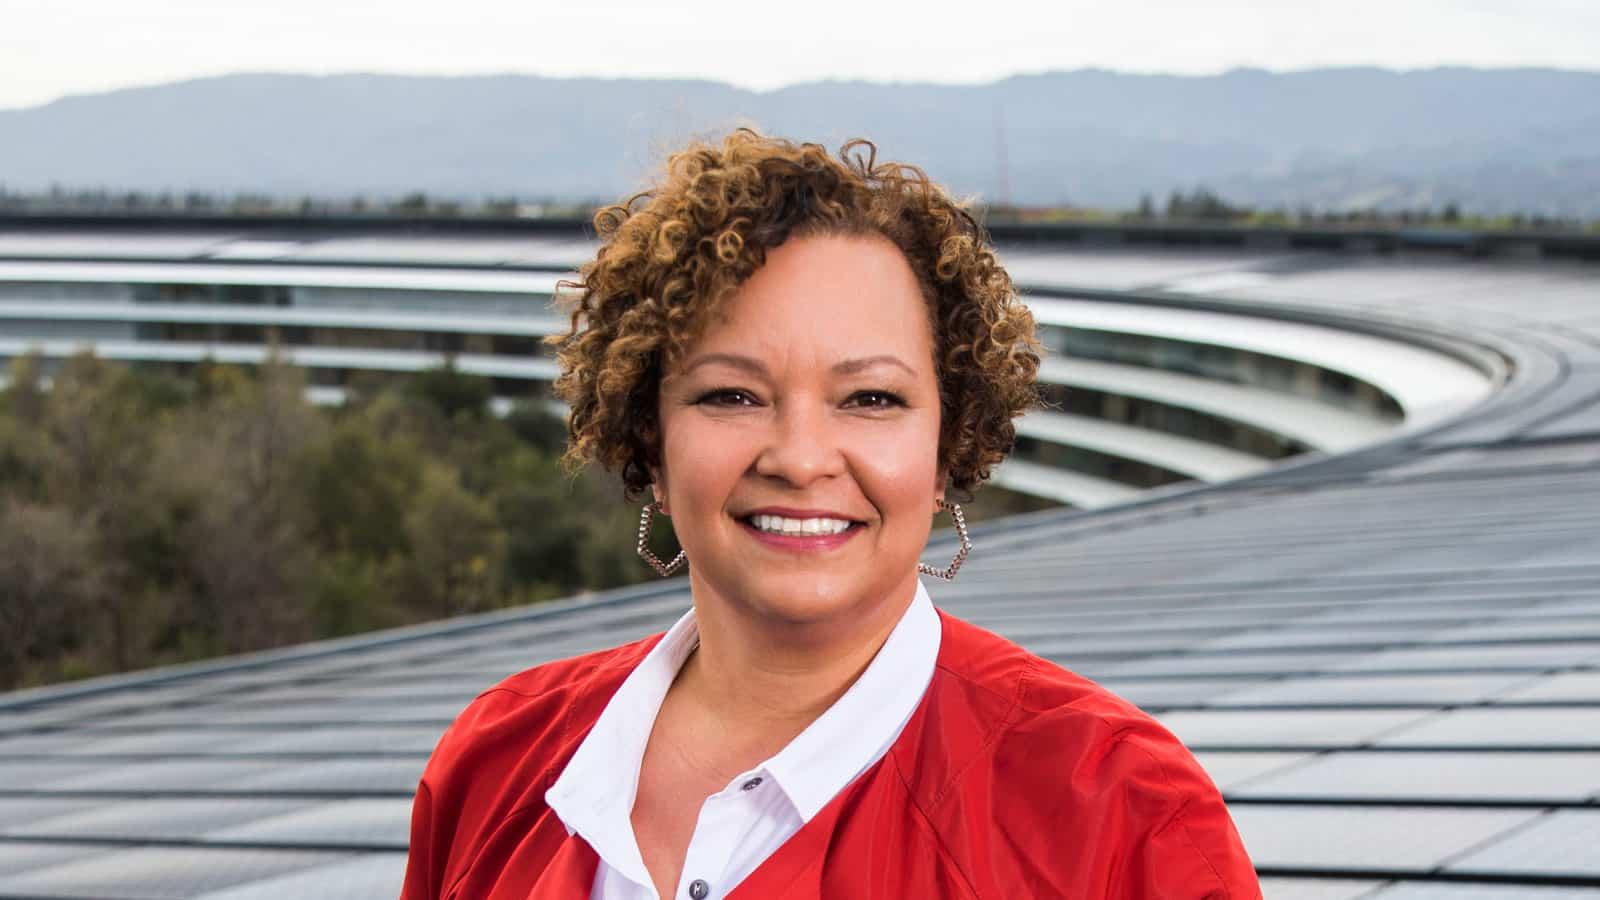 Apple's super woman talks about Environmental friendly initiatives